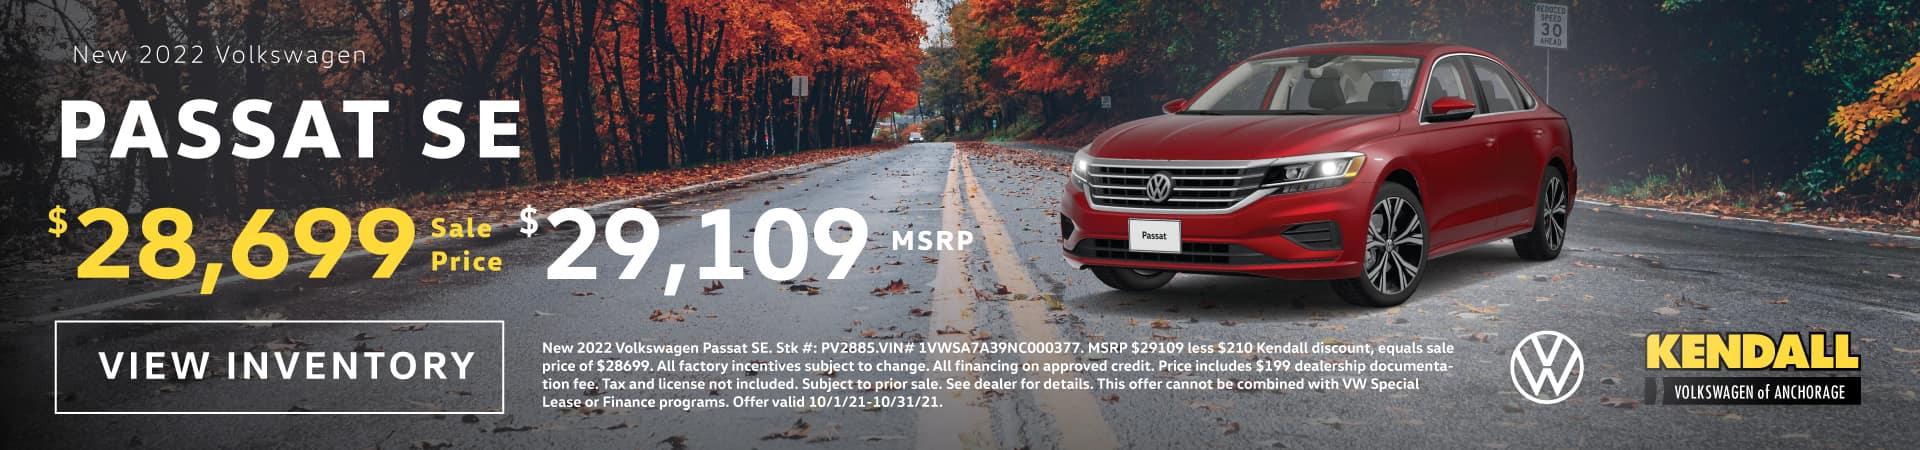 18020-AncVol-Oct21-Web-banners-PASSAT REV